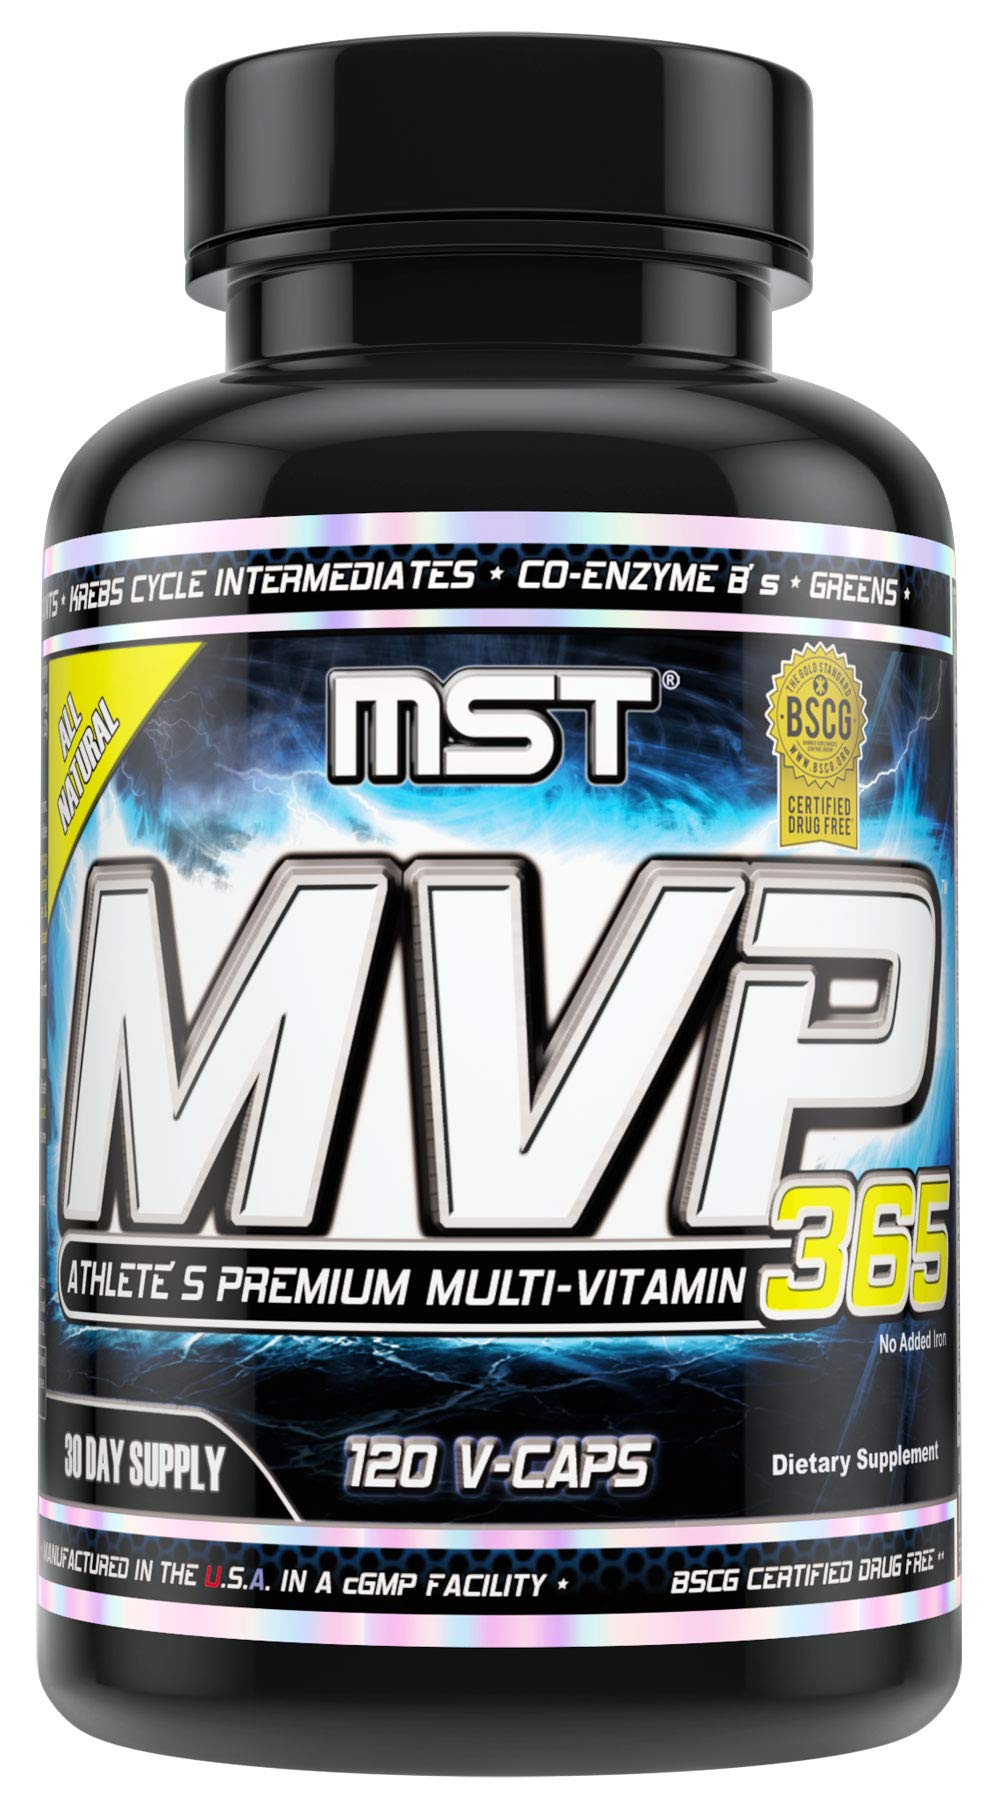 MVP-365 Multi Vitamin, Vitamin C, Vitamin A, 1000iu Vitamin D3, L-5 Methyltetrahydrofolate, Niacin, Pantothenic Acid, 120 V-Caps, BSCG Certified by MST Millennium Sport Technologies